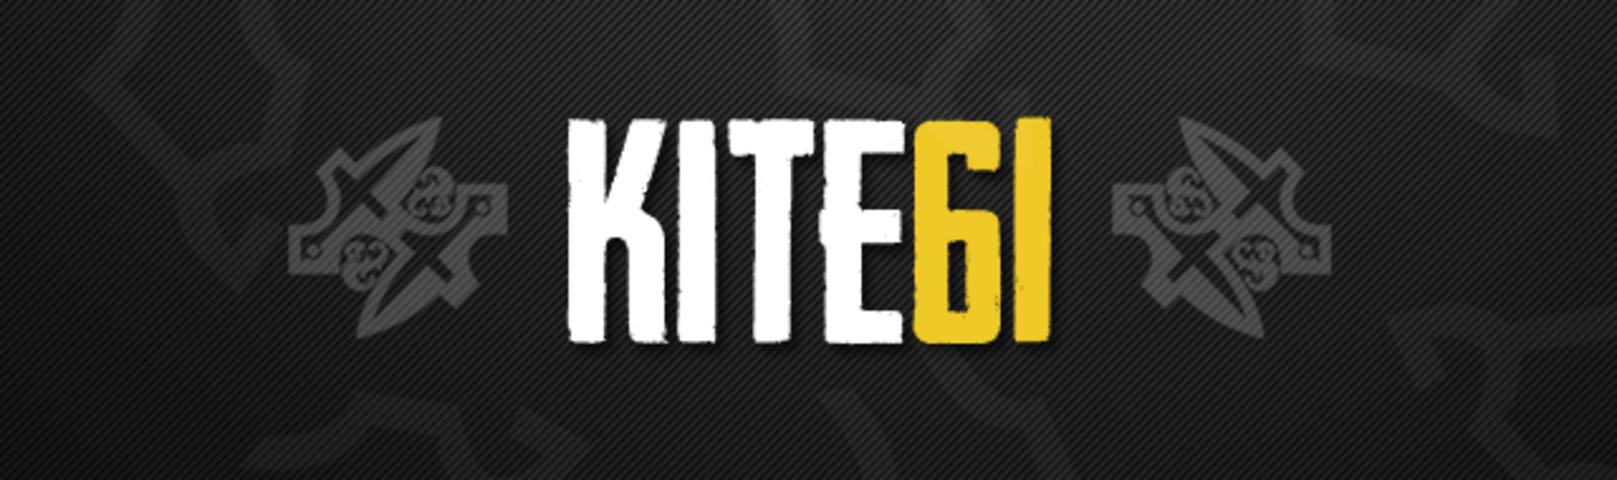 Kite61